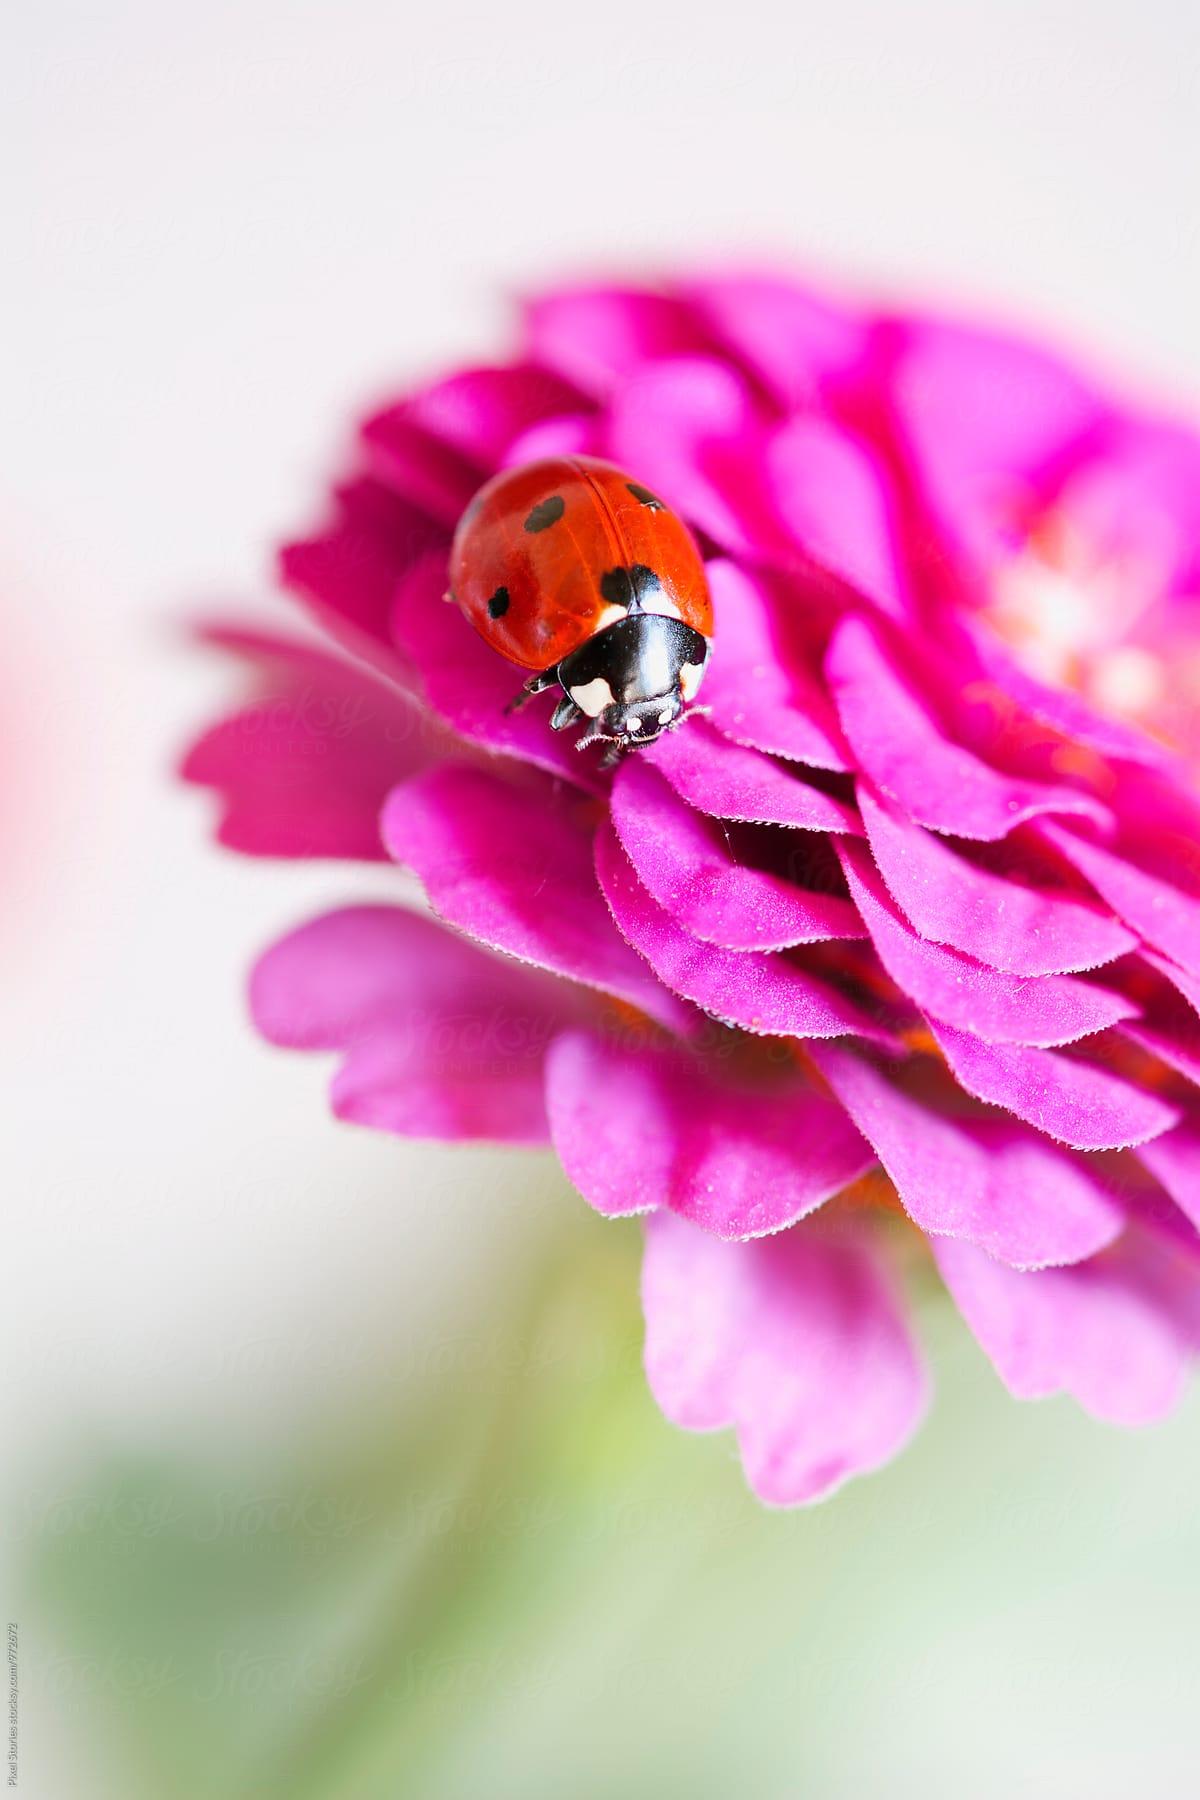 Ladybug On A Flower : ladybug, flower, Ladybug, Flower, Pixel, Stories, Ladybug,, Macro, Stocksy, United